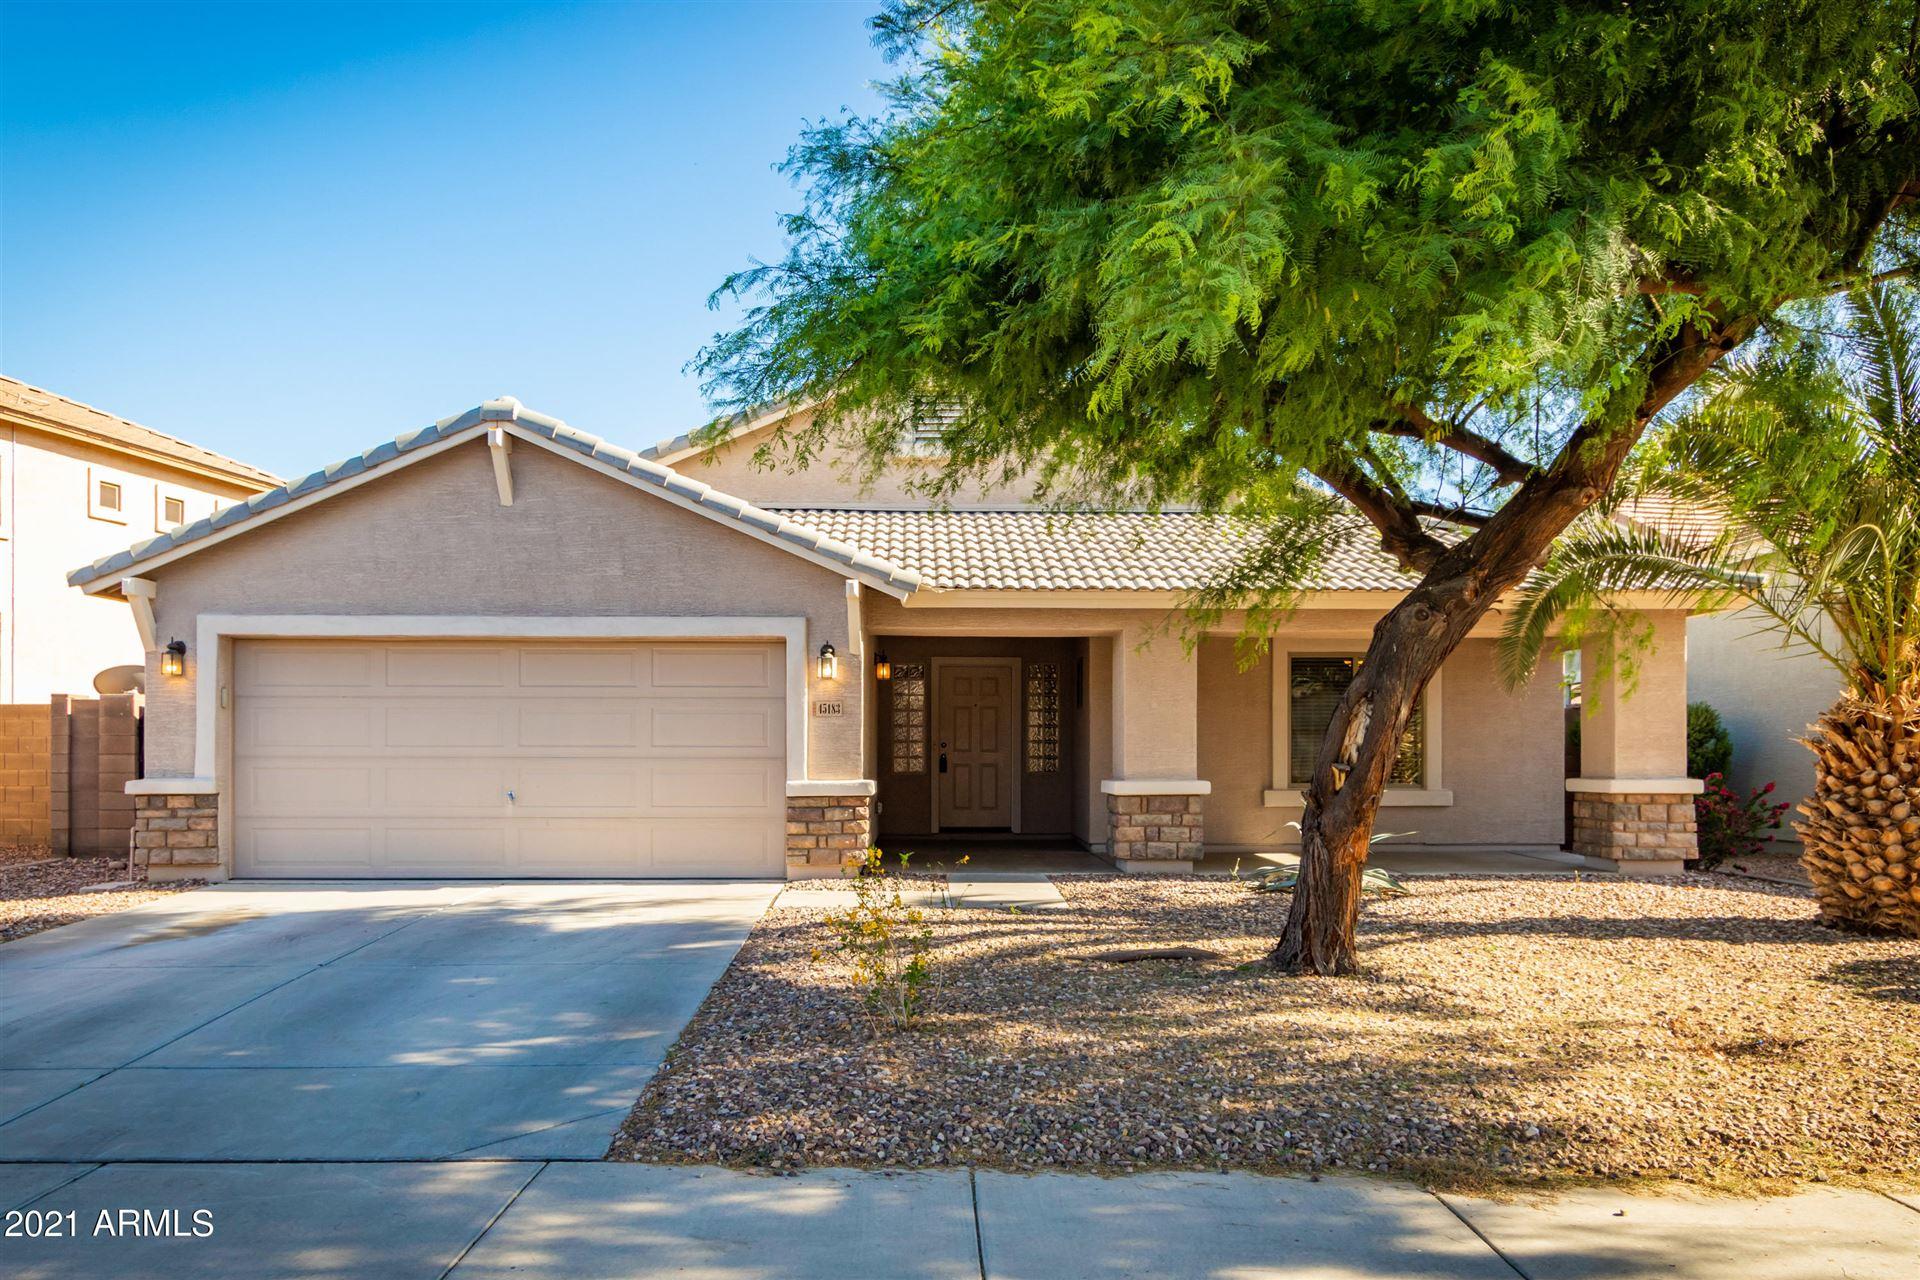 Photo for 45183 W RHEA Road, Maricopa, AZ 85139 (MLS # 6229442)